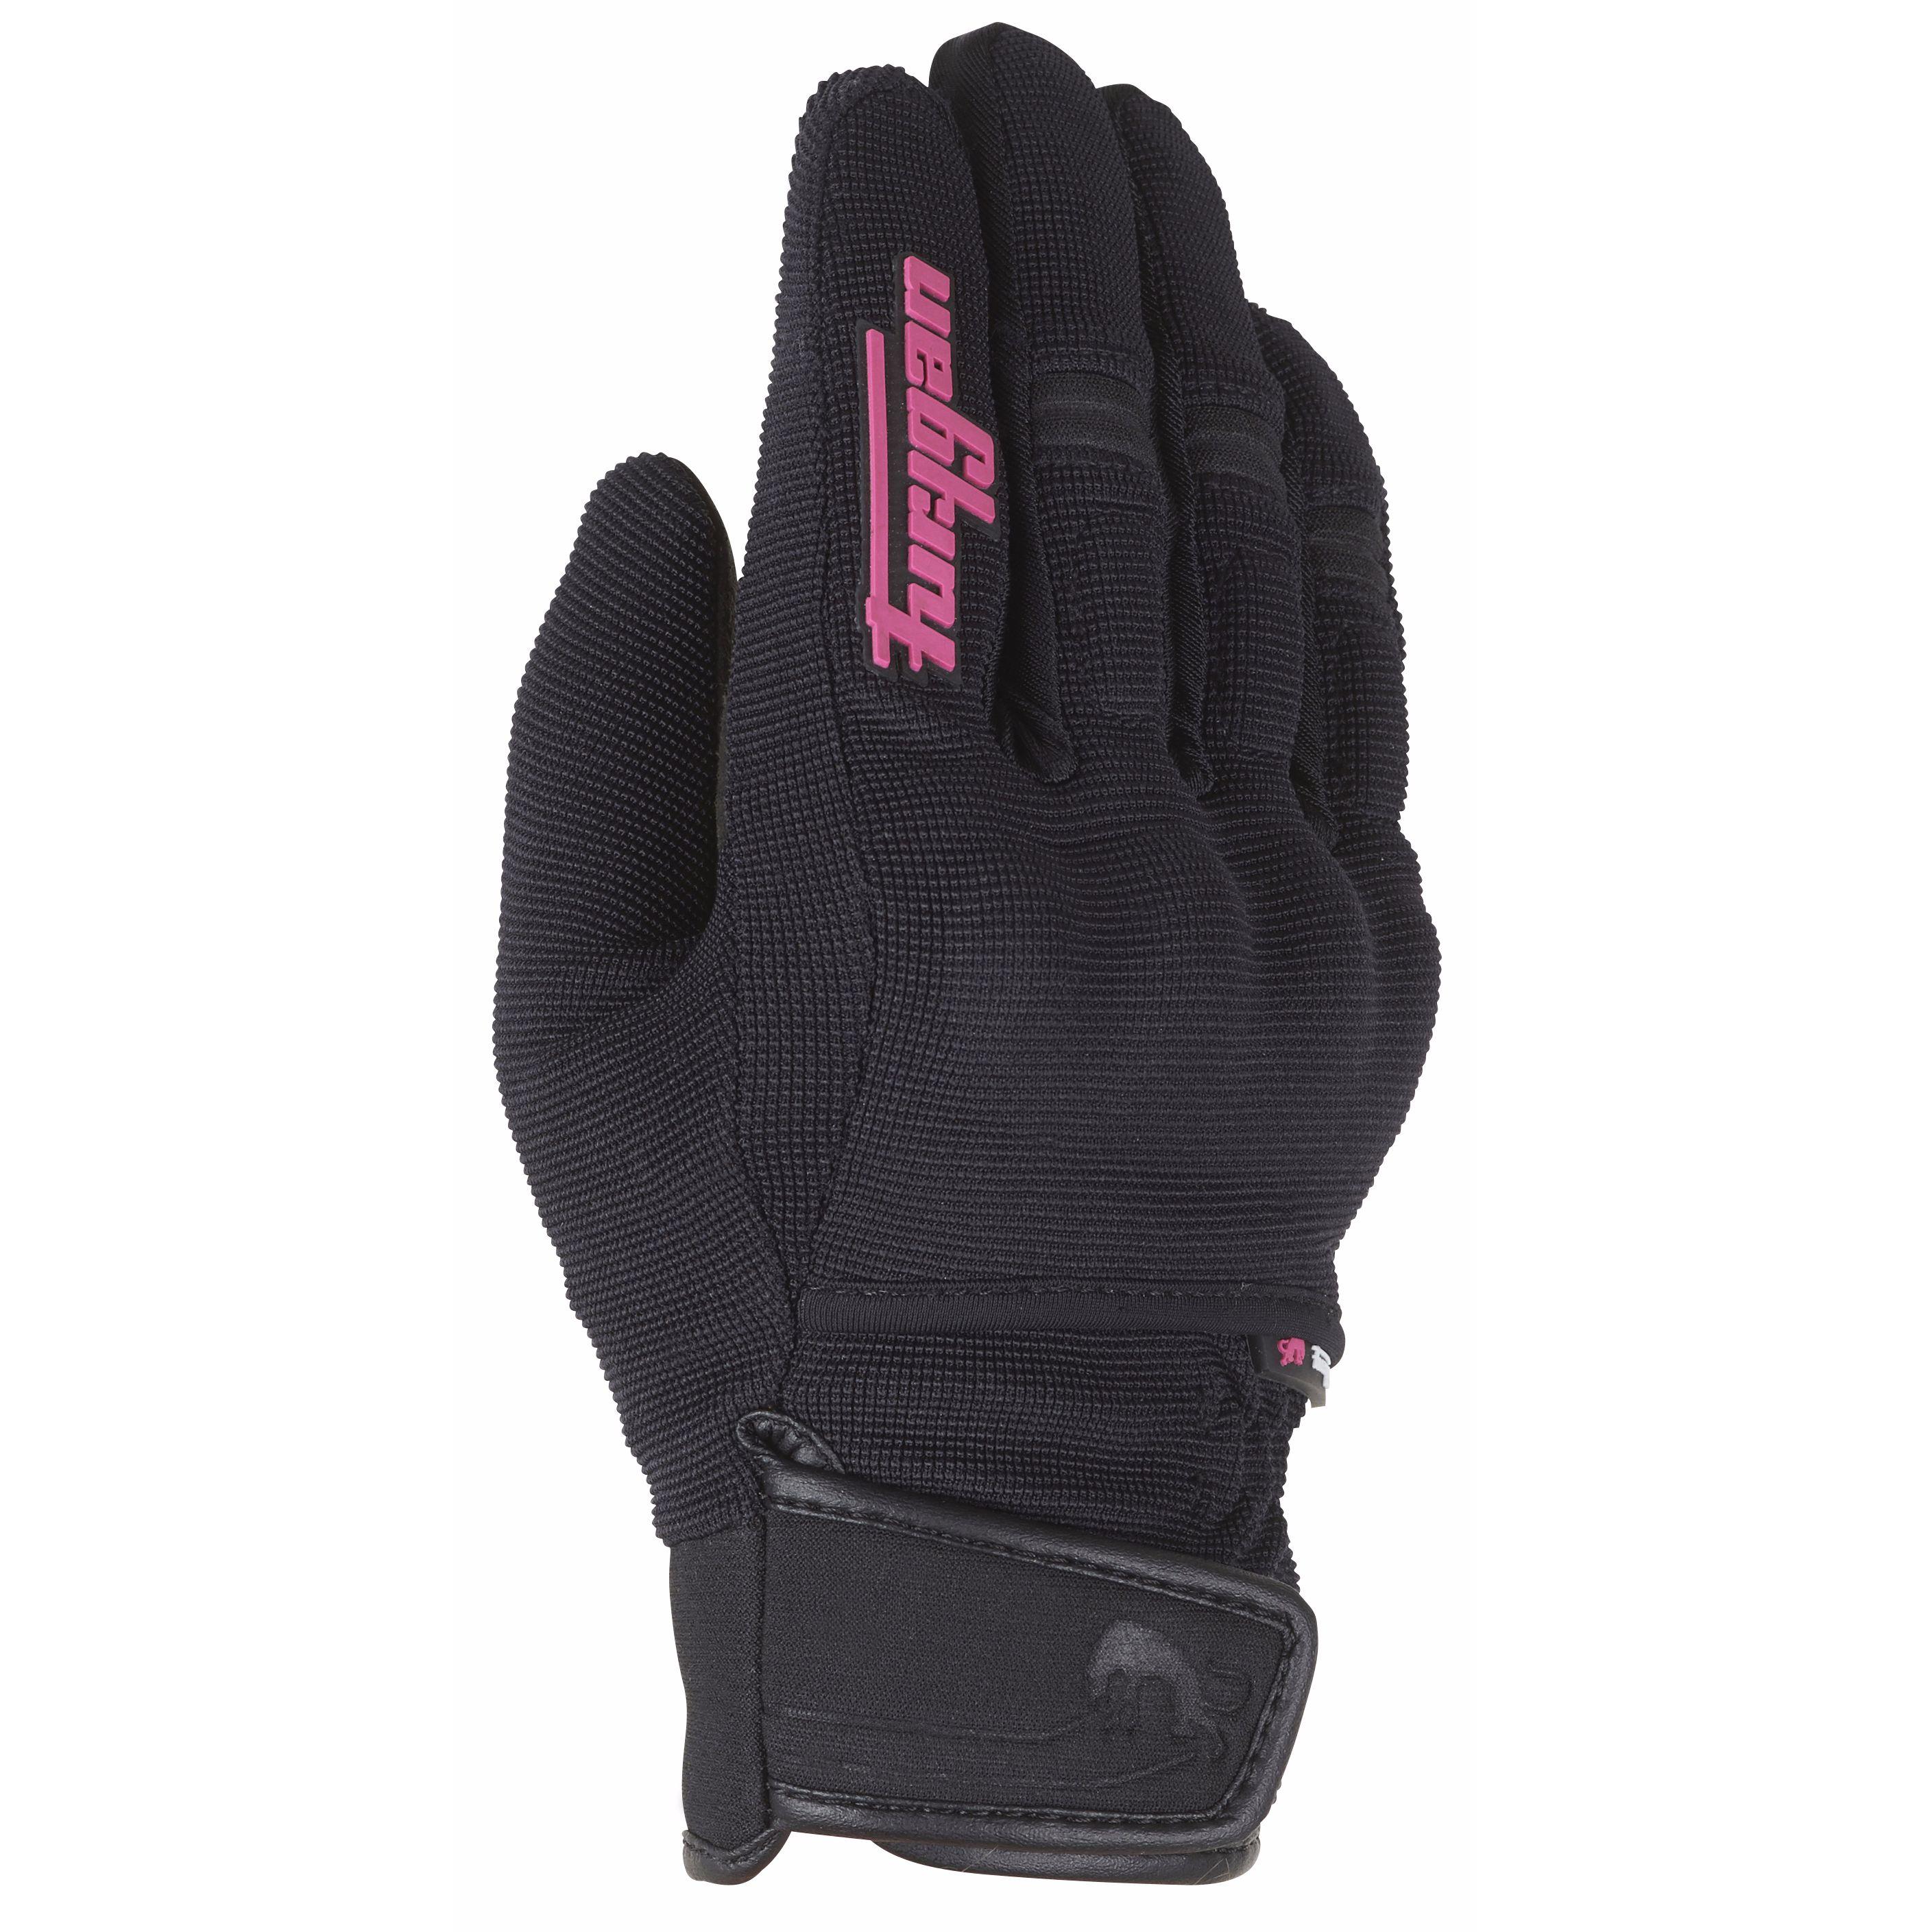 gants furygan jet evo lady kid gants moto. Black Bedroom Furniture Sets. Home Design Ideas